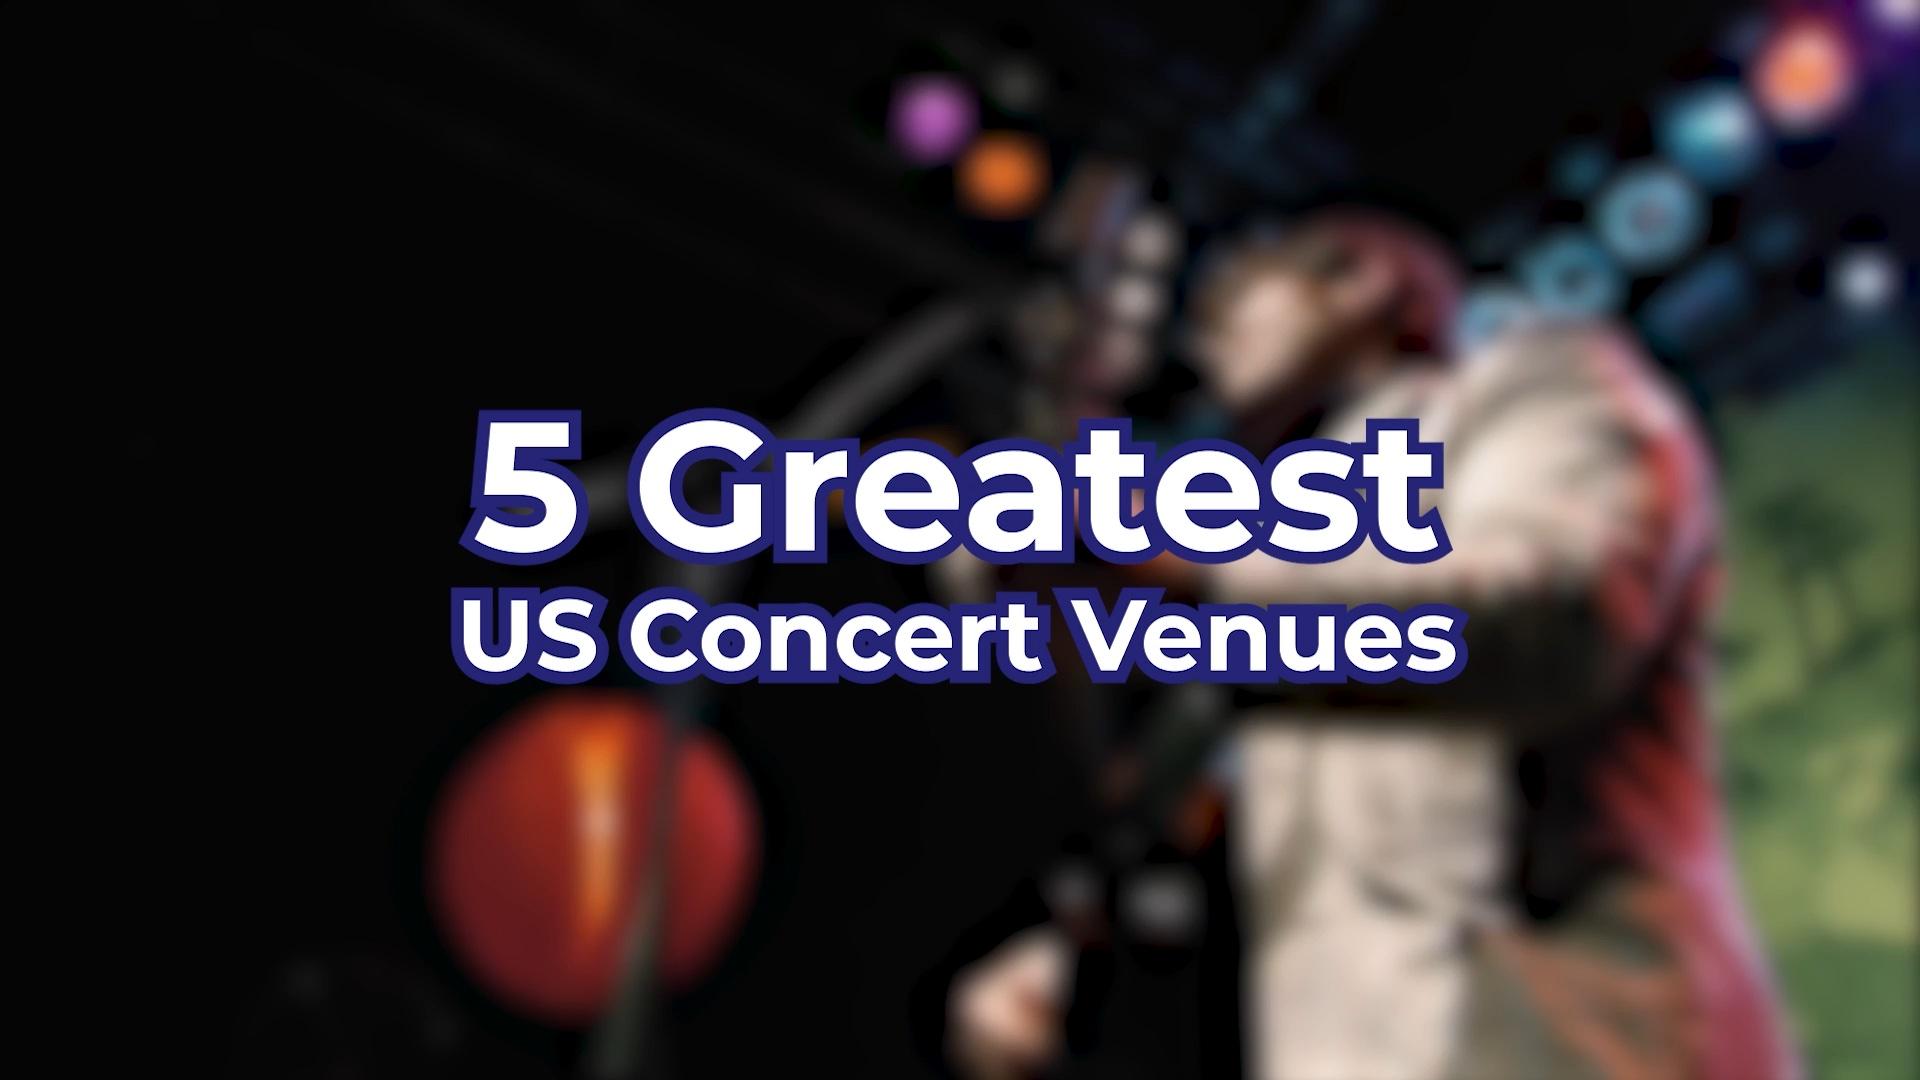 5 Greatest US Concert Venues